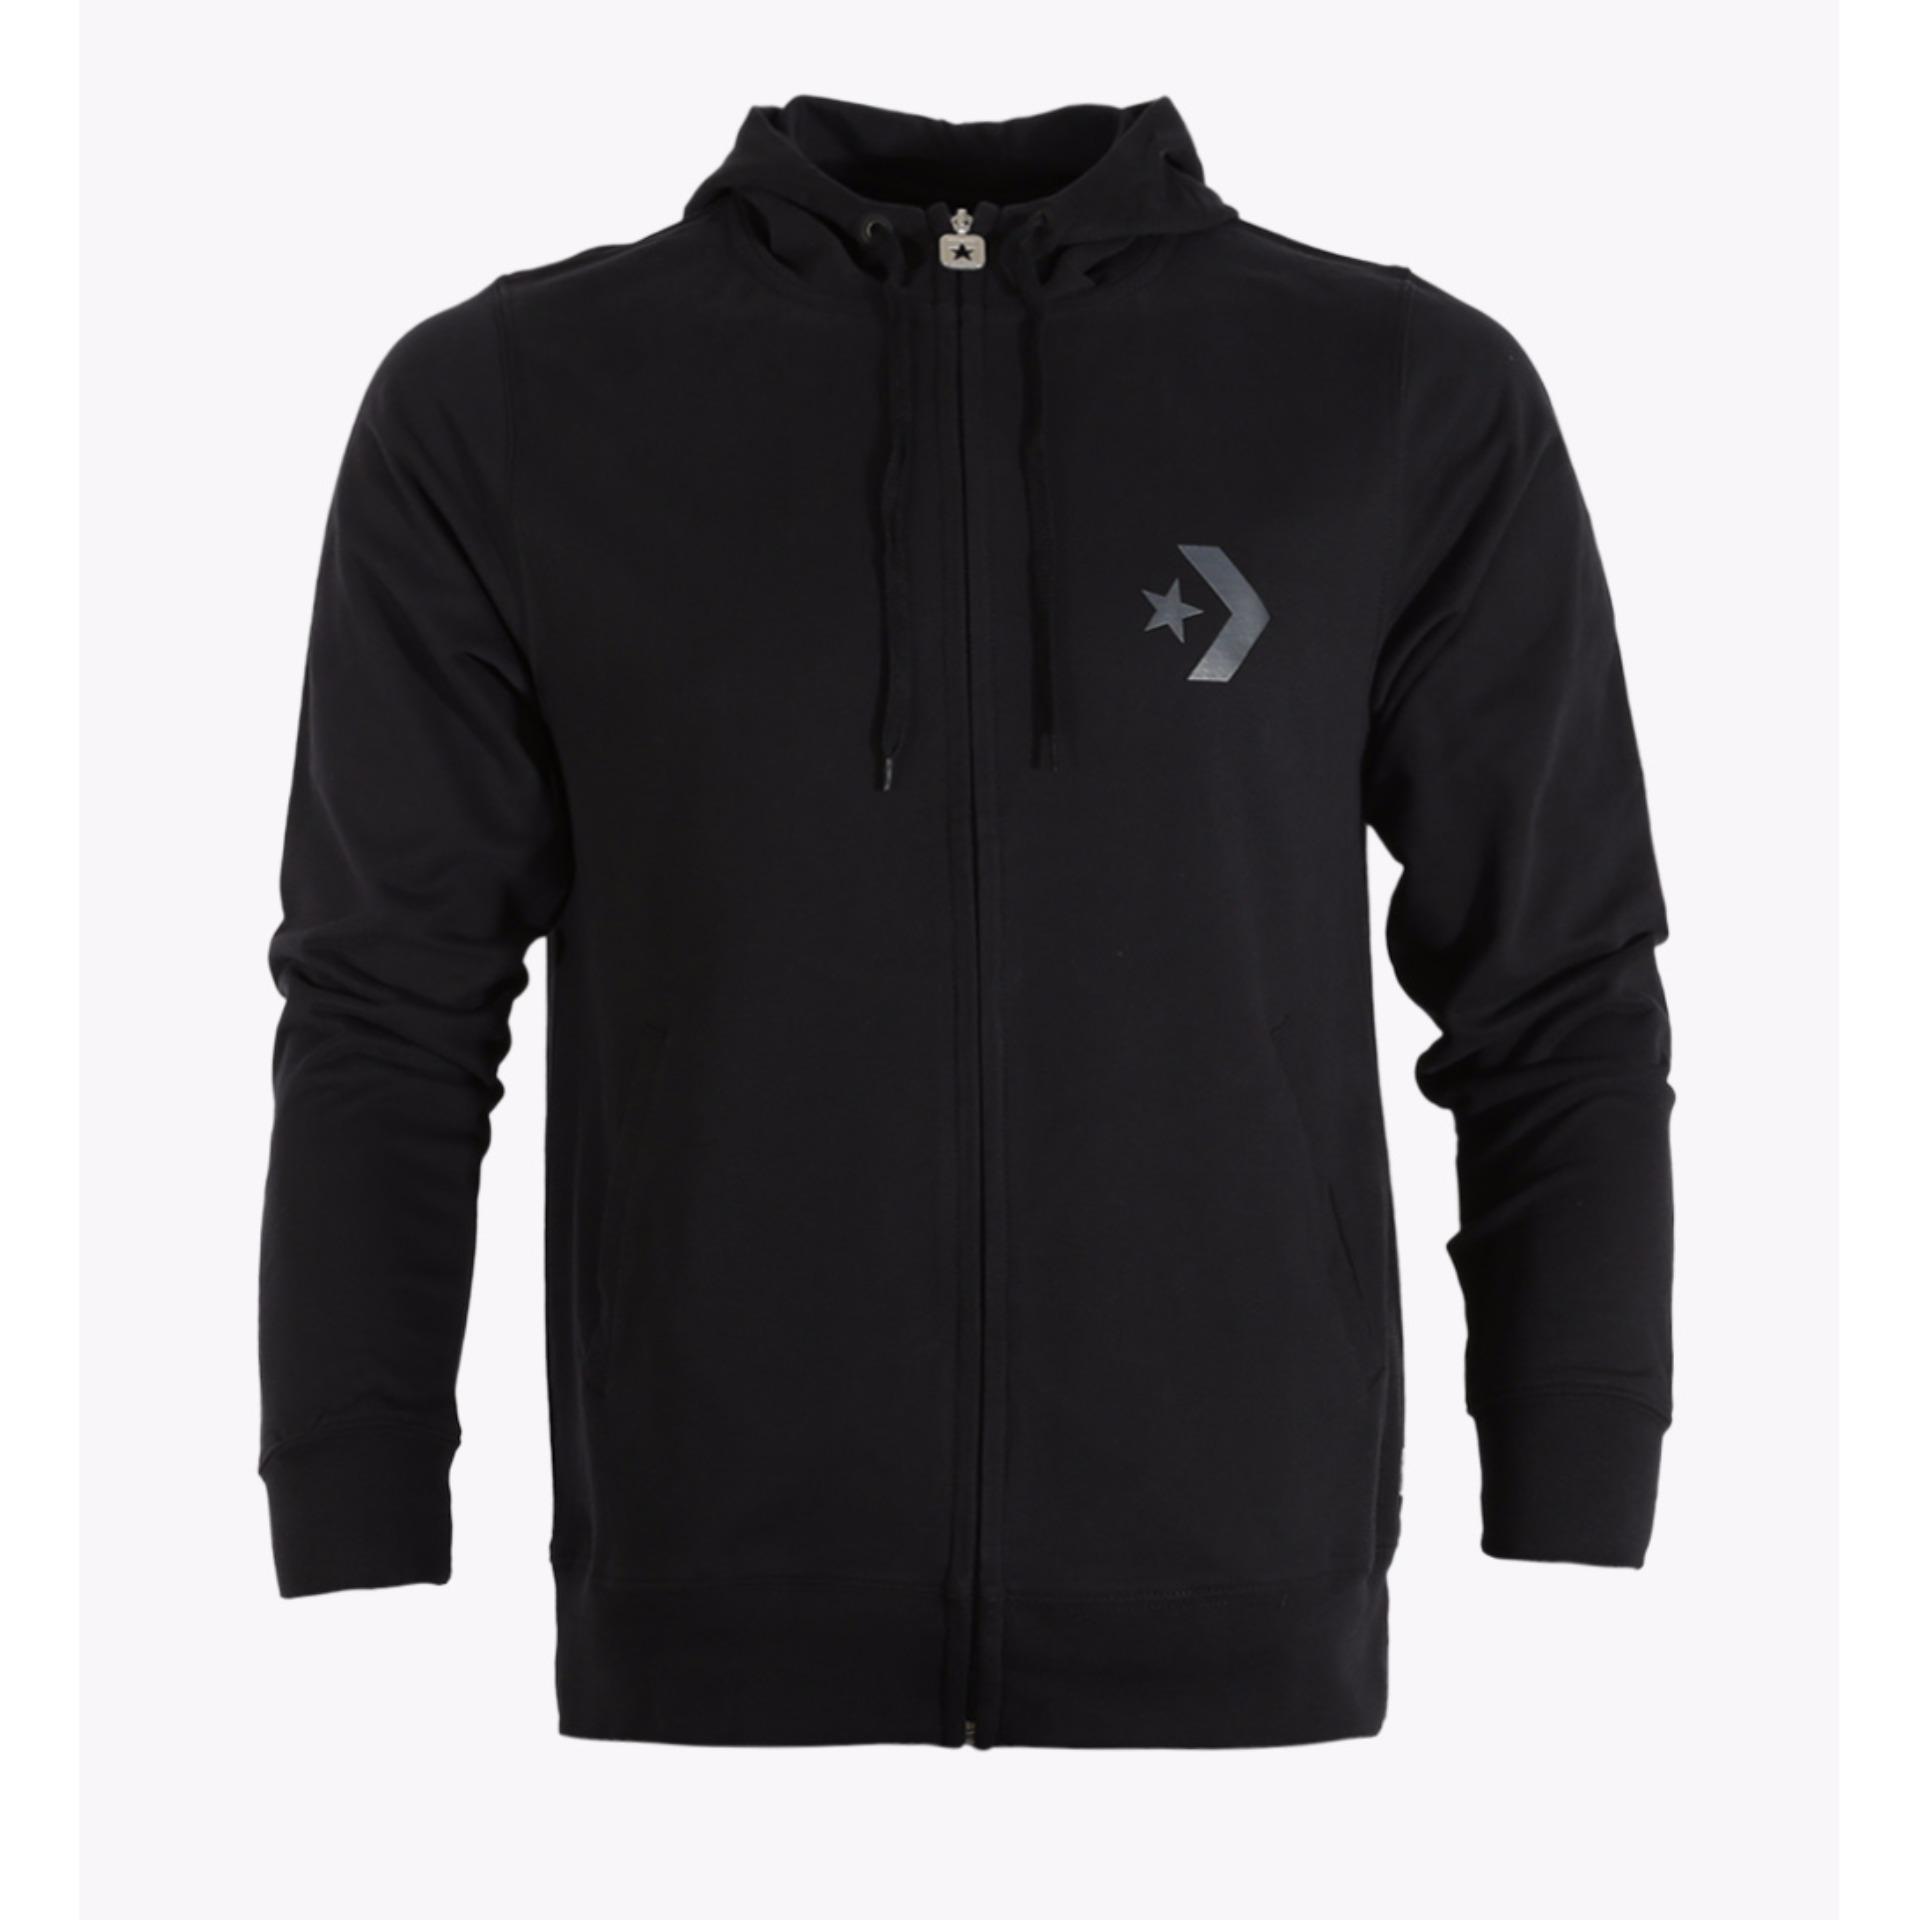 Promo Converse Men S Jacket Hitam